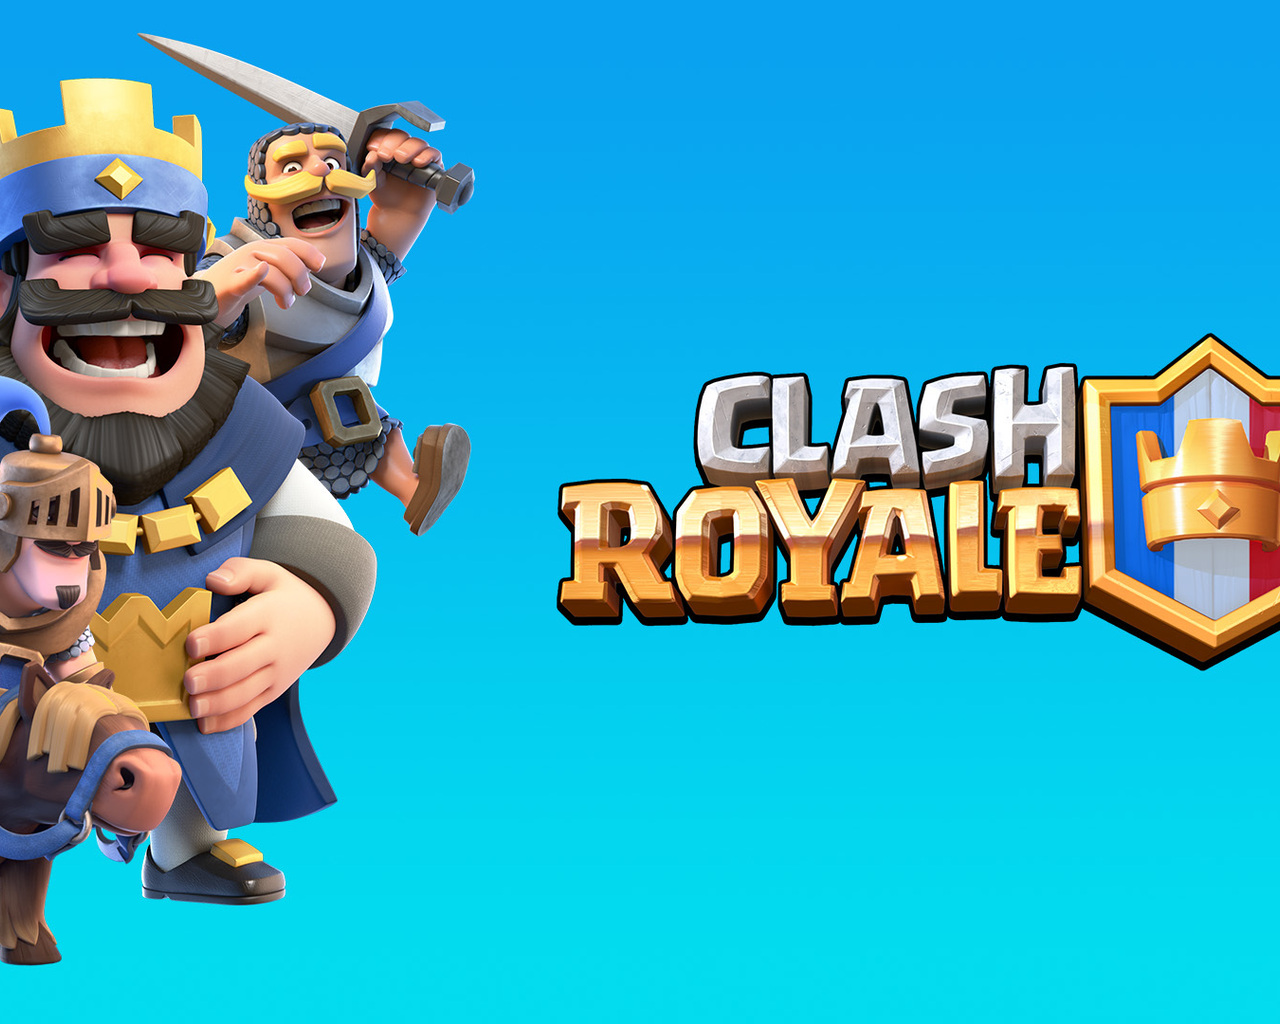 1280x1024 clash royale desktop 1280x1024 resolution hd 4k wallpapers images backgrounds - Clash royale 2560x1440 ...